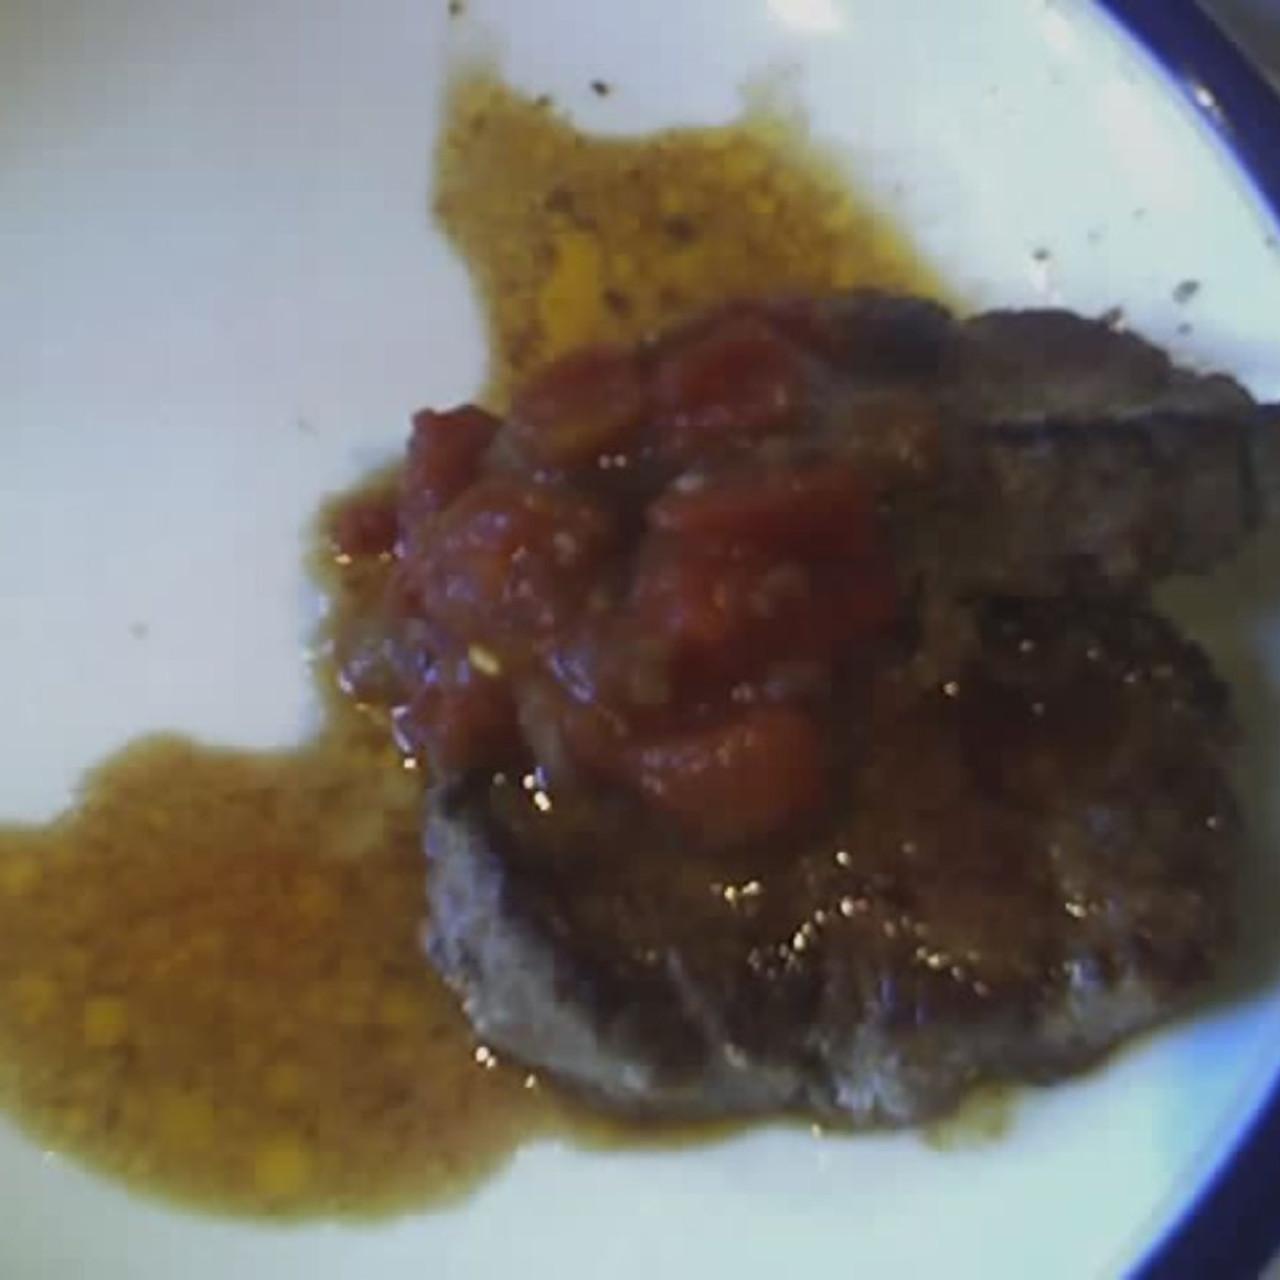 Zesty Chili Sirloin Steak